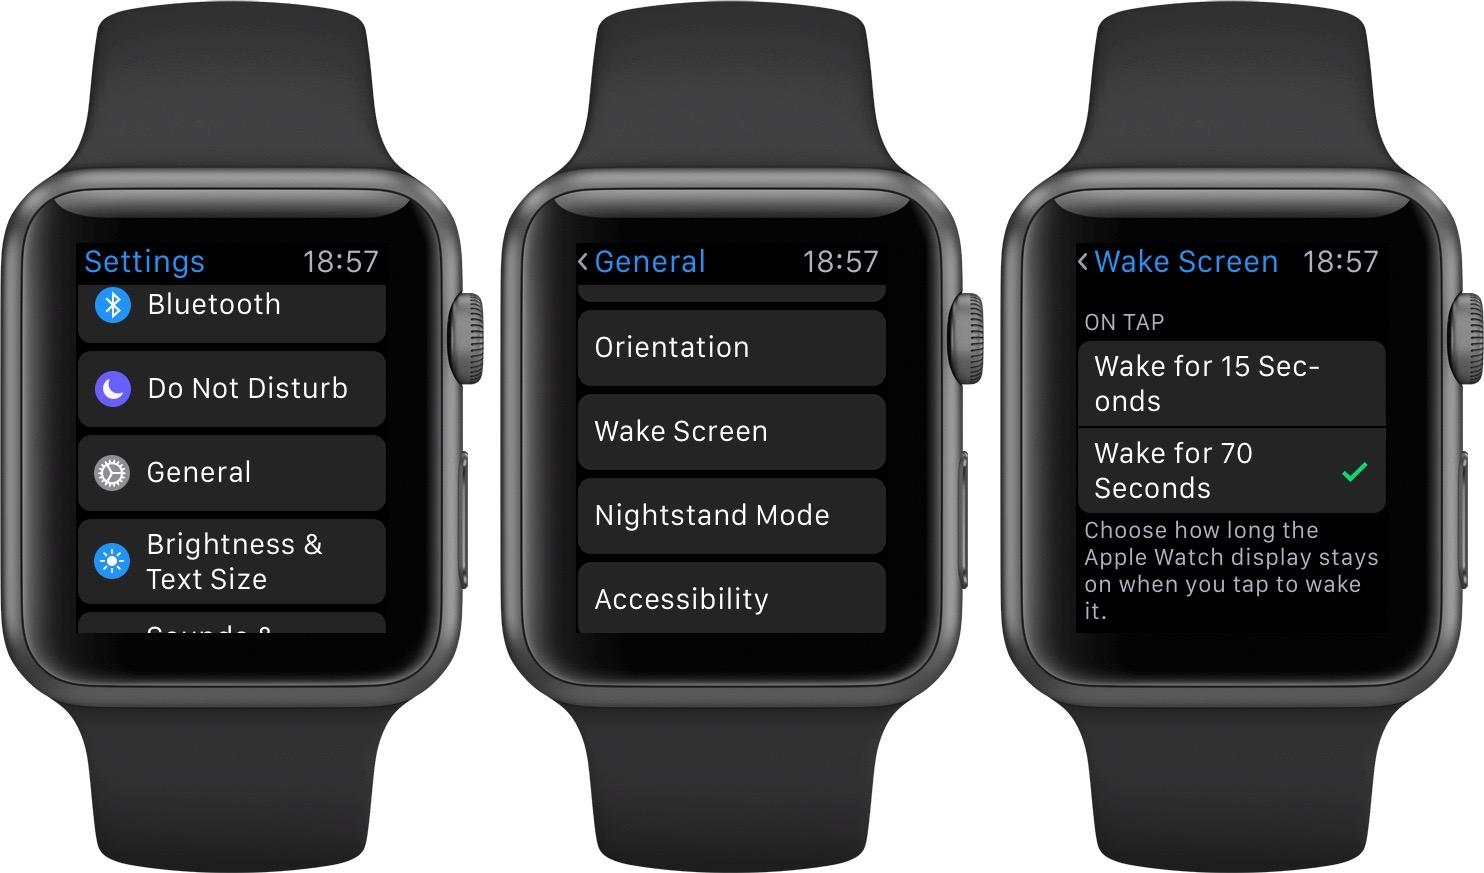 watchOS 2 Wake Screen Apple Watch screenshot 001